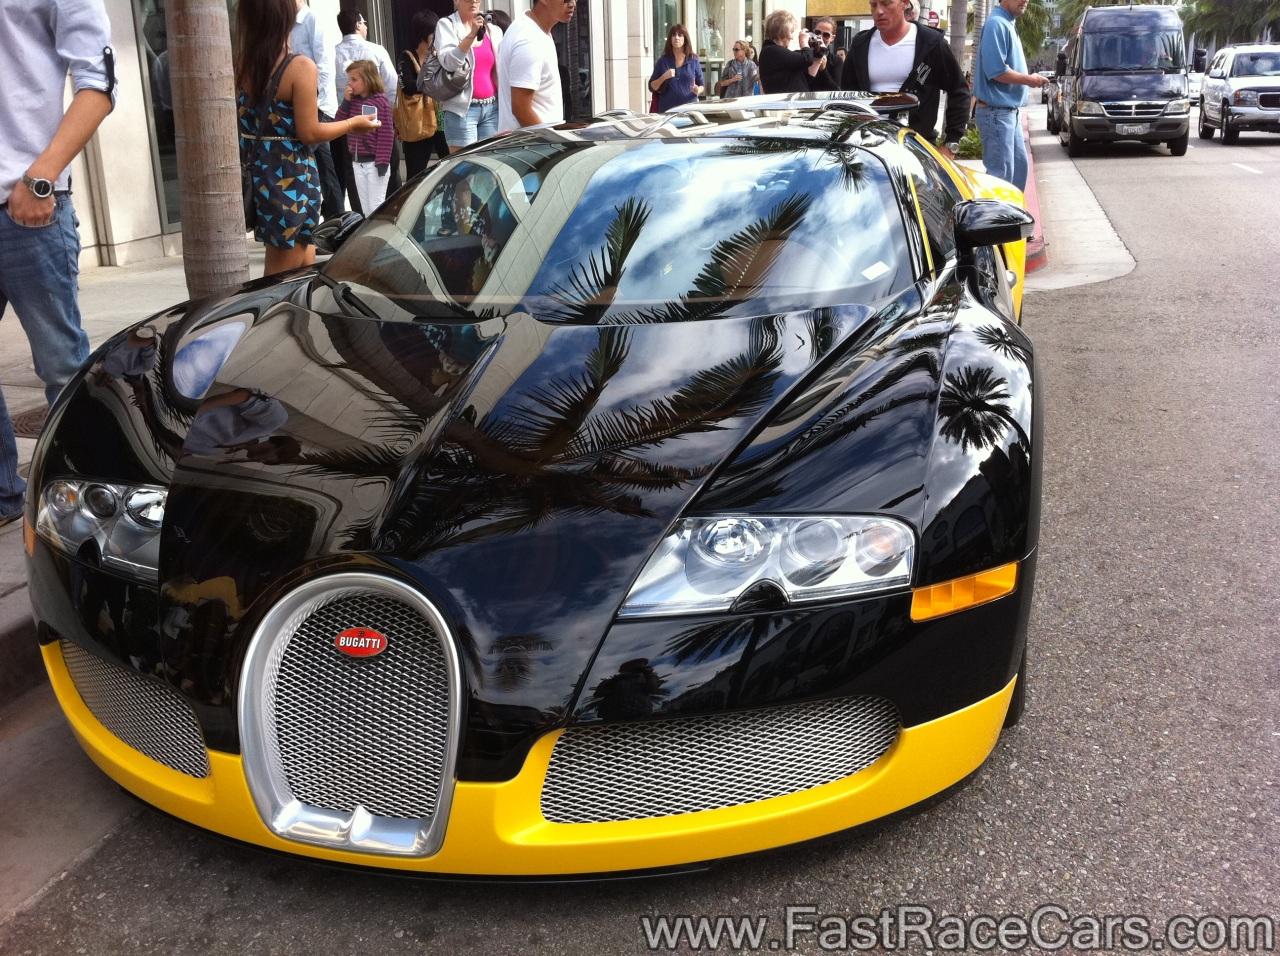 exotic cars bugatti picture of black and yellow bugatti veyron. Black Bedroom Furniture Sets. Home Design Ideas